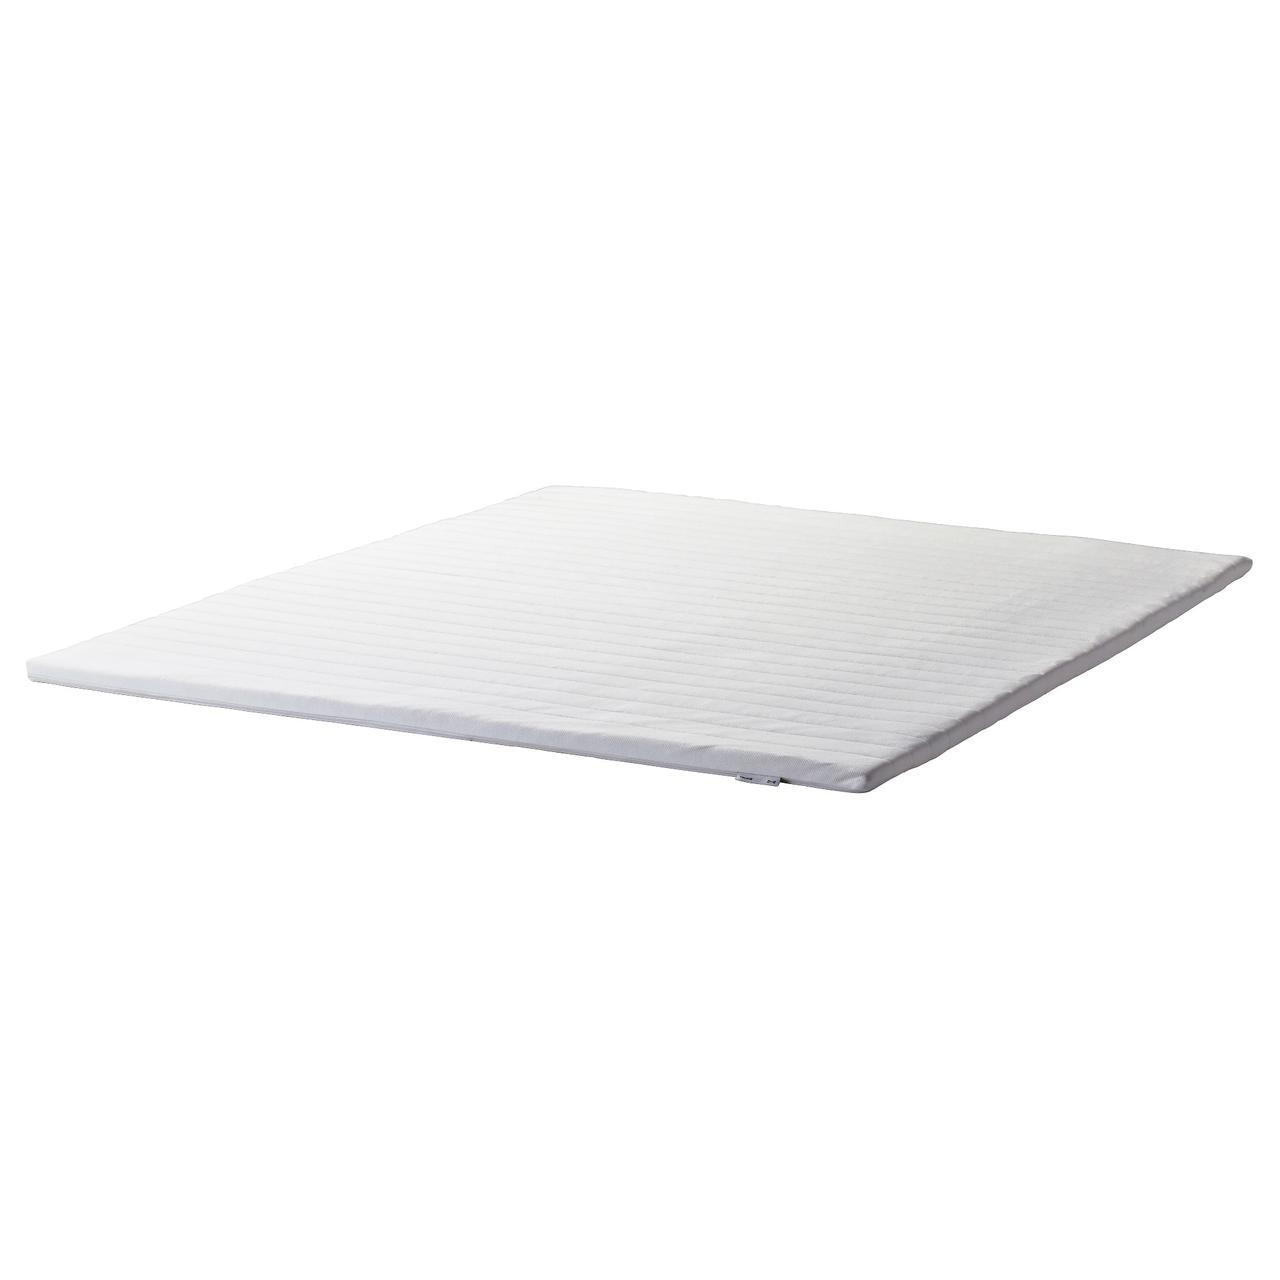 IKEA TALGJE (802.982.33) Тонкий матрас, белый